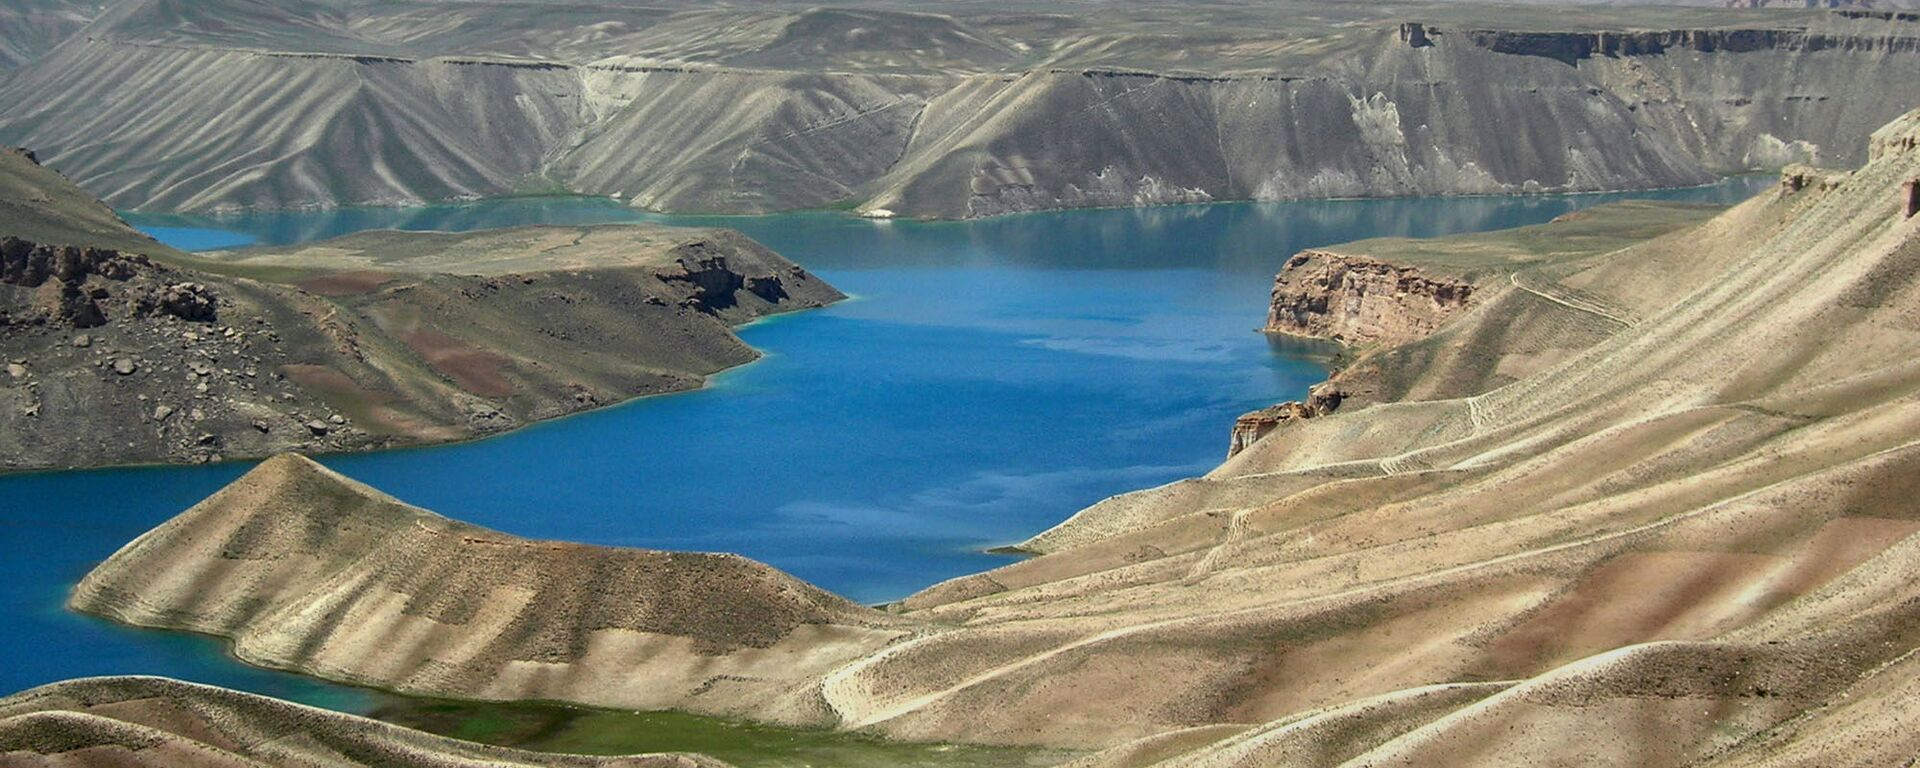 Банд-э-Амир в провинции Бамиан в Афганистане - Sputnik Mundo, 1920, 25.08.2021